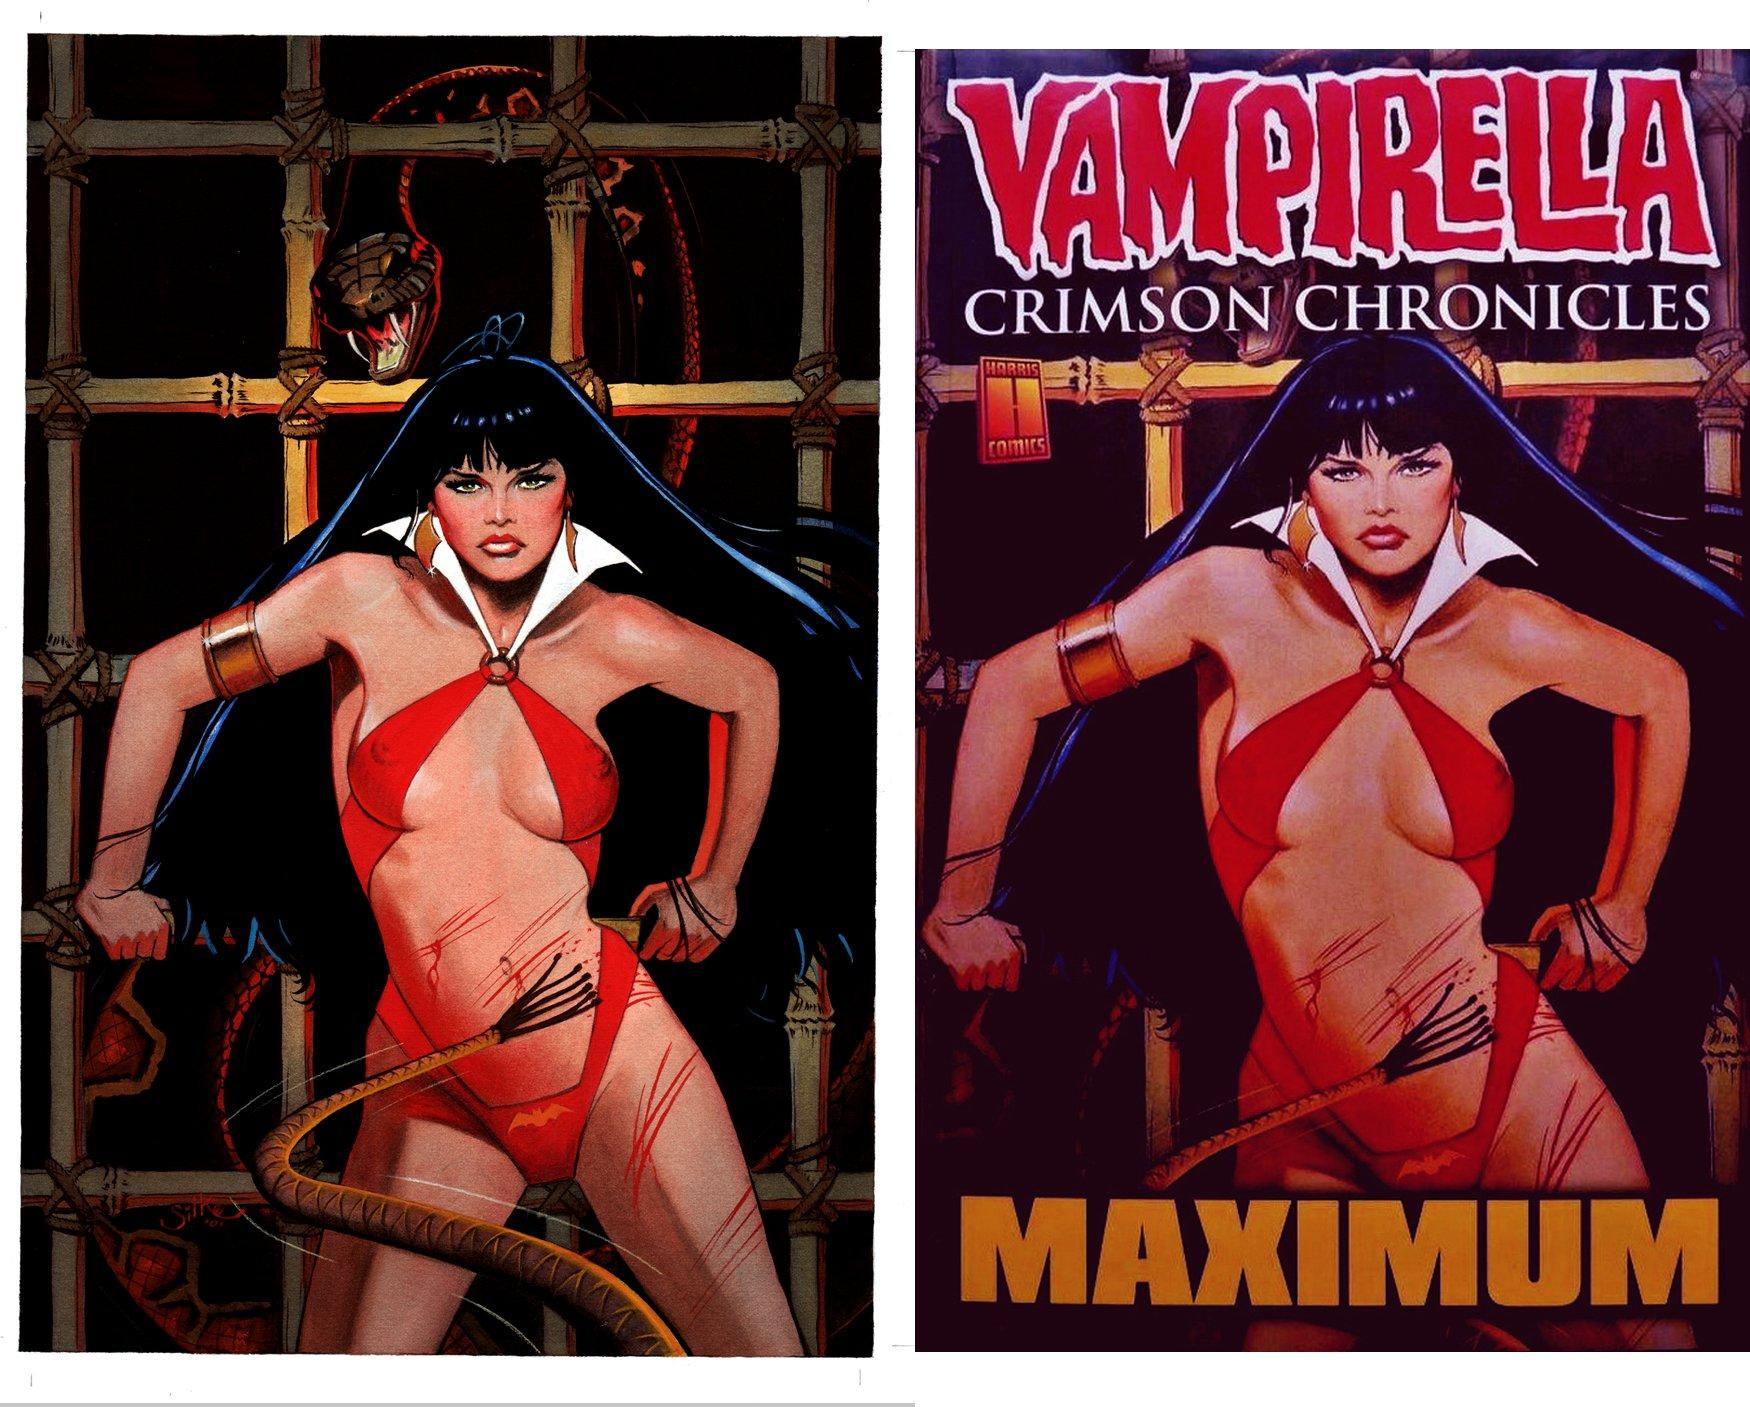 Vampirella Crimson Chronicles #1 Cover Painting (2001)